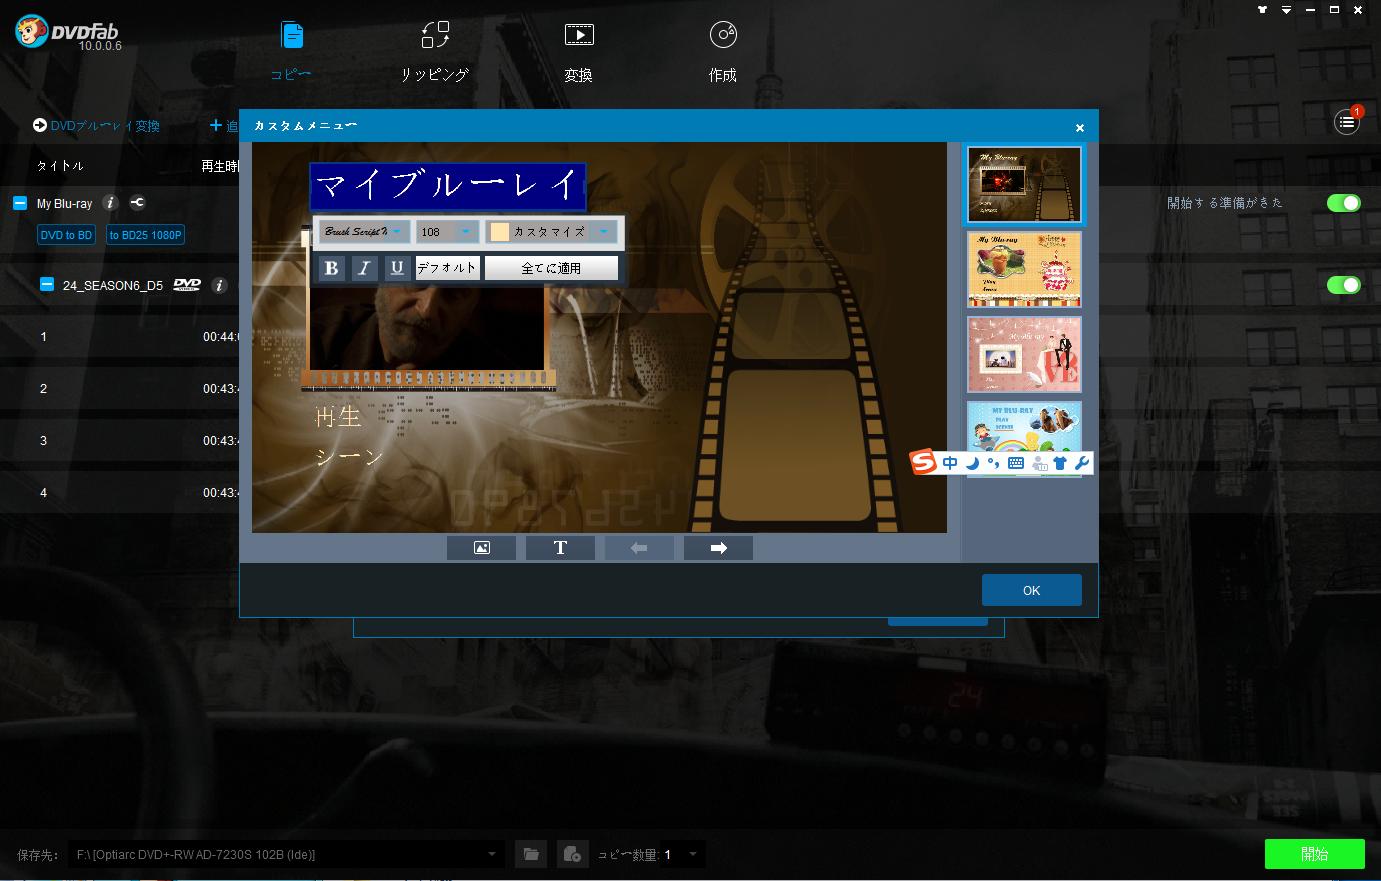 DVDfab DVD ブルーレイ 変換 スクリーンショット 3